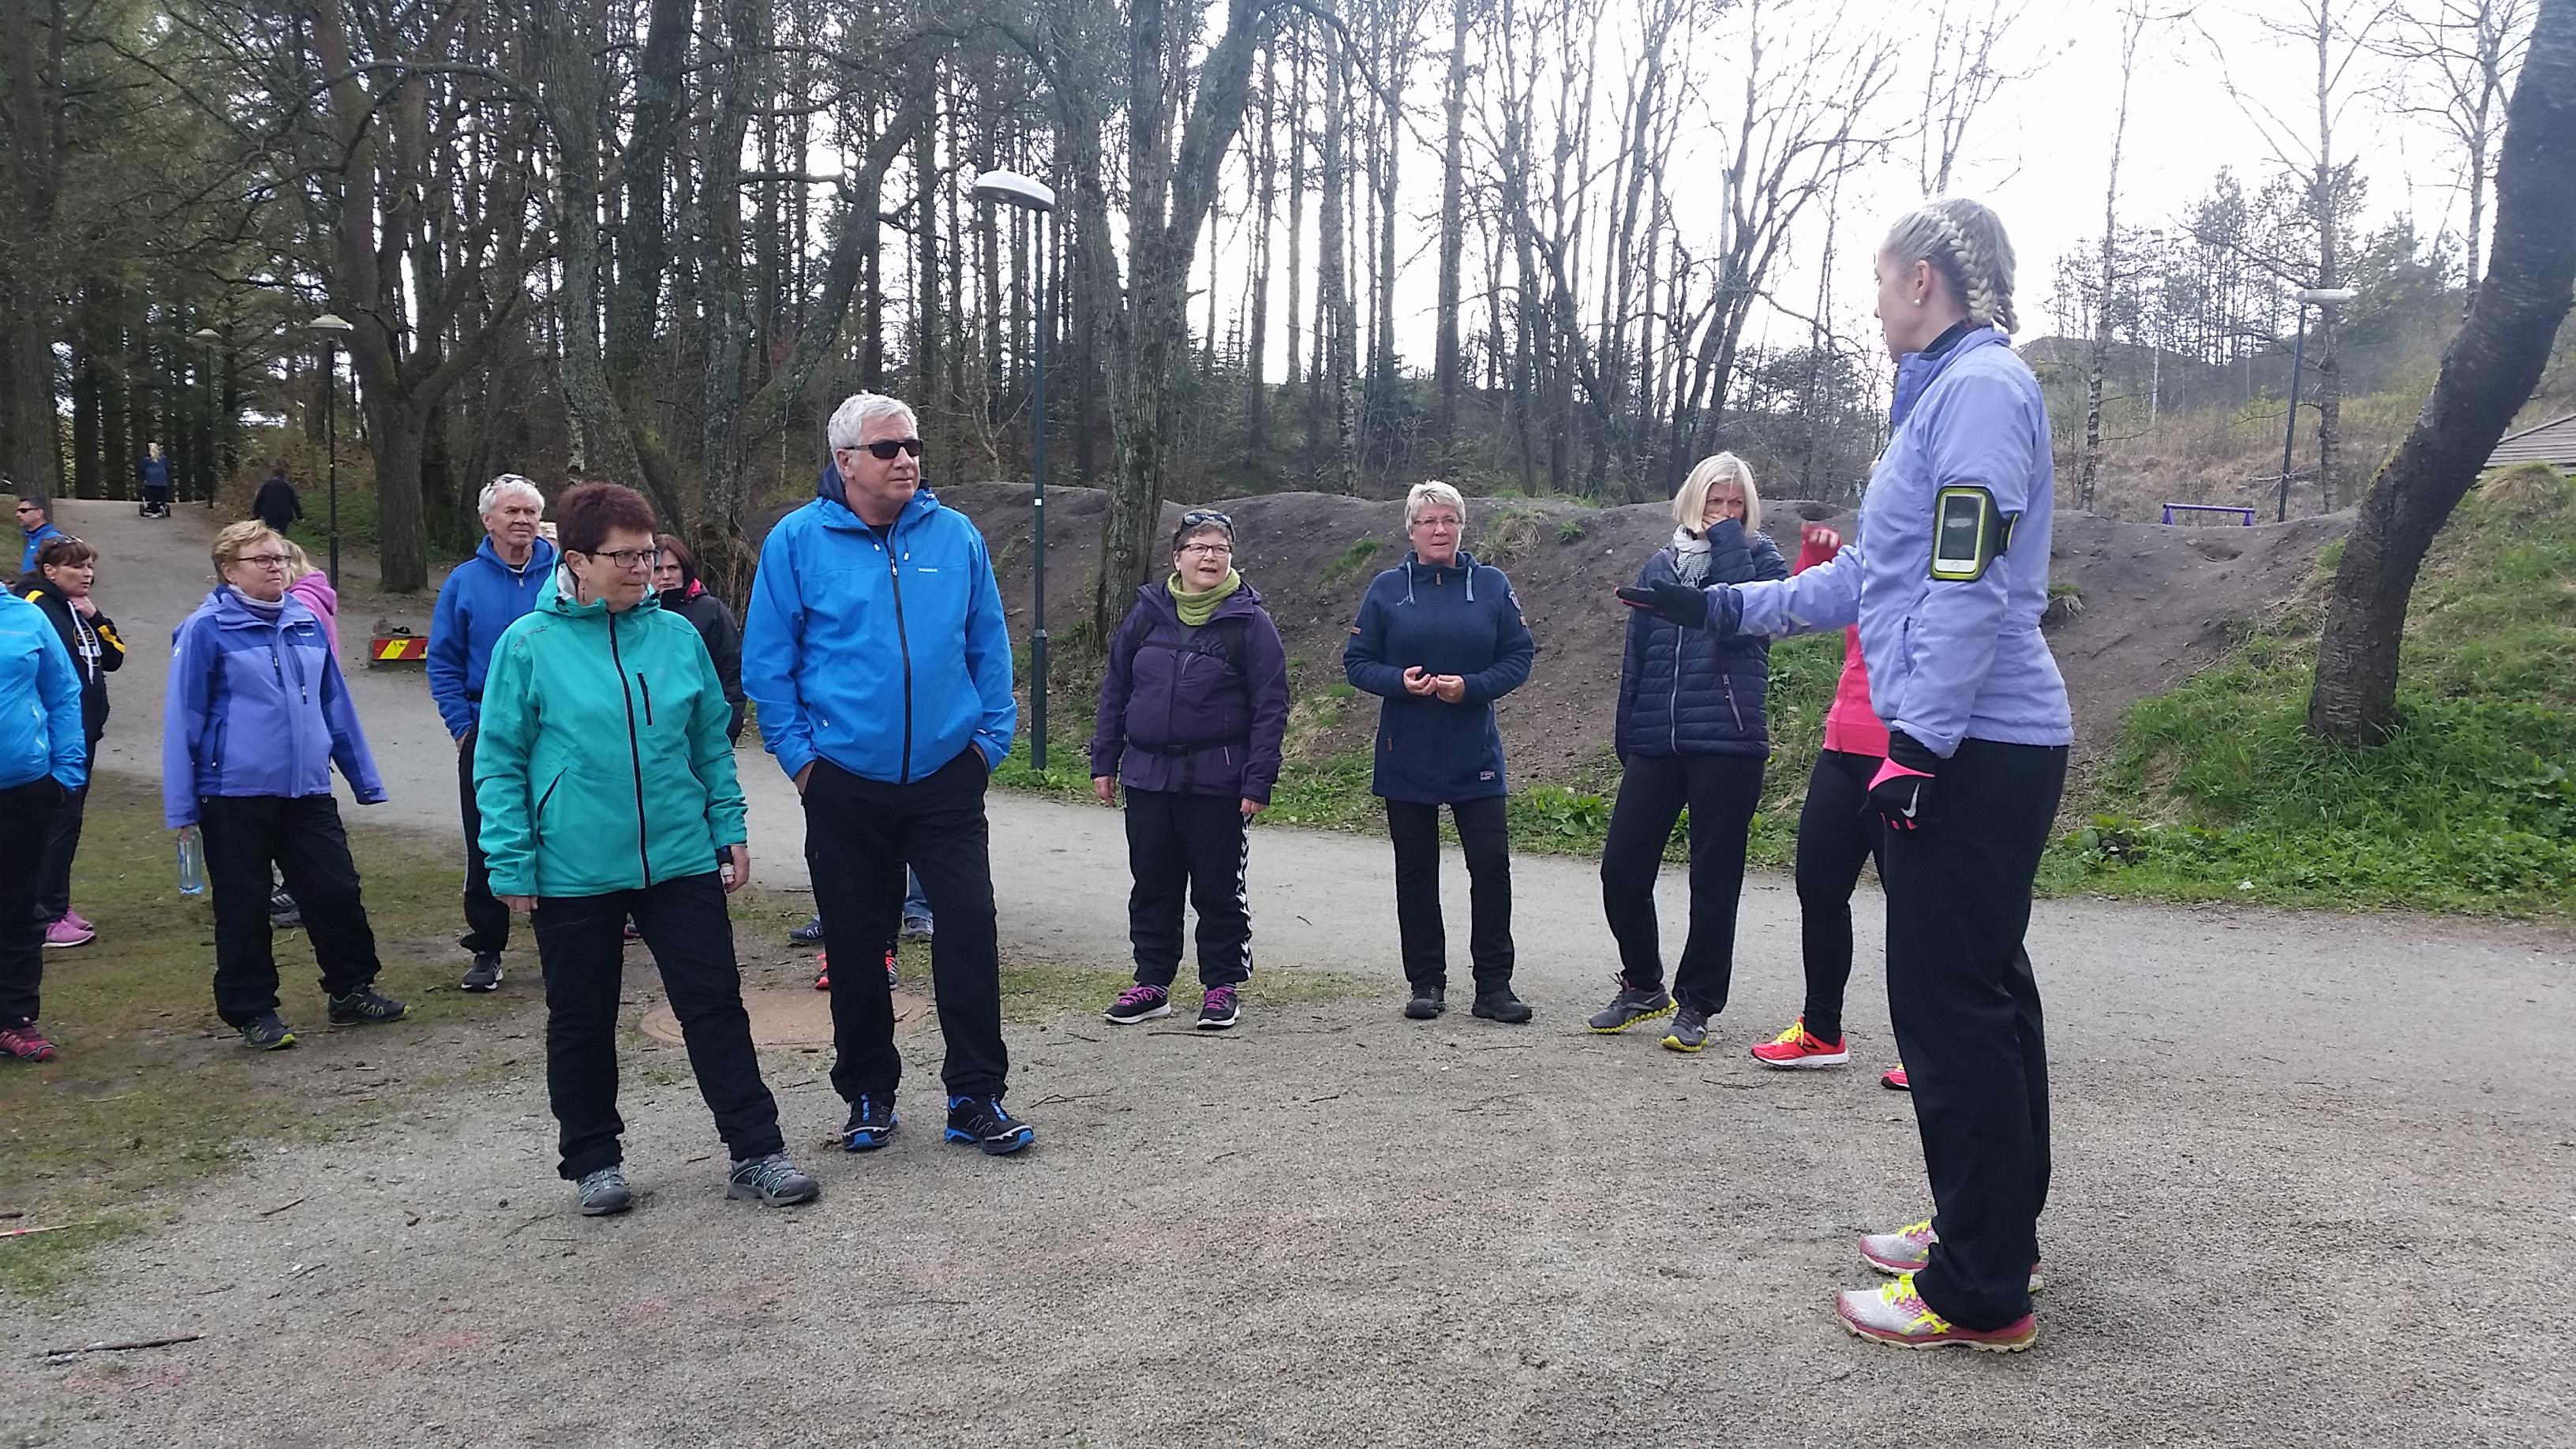 Instruktør informerer en gruppe turkledde mnnesker